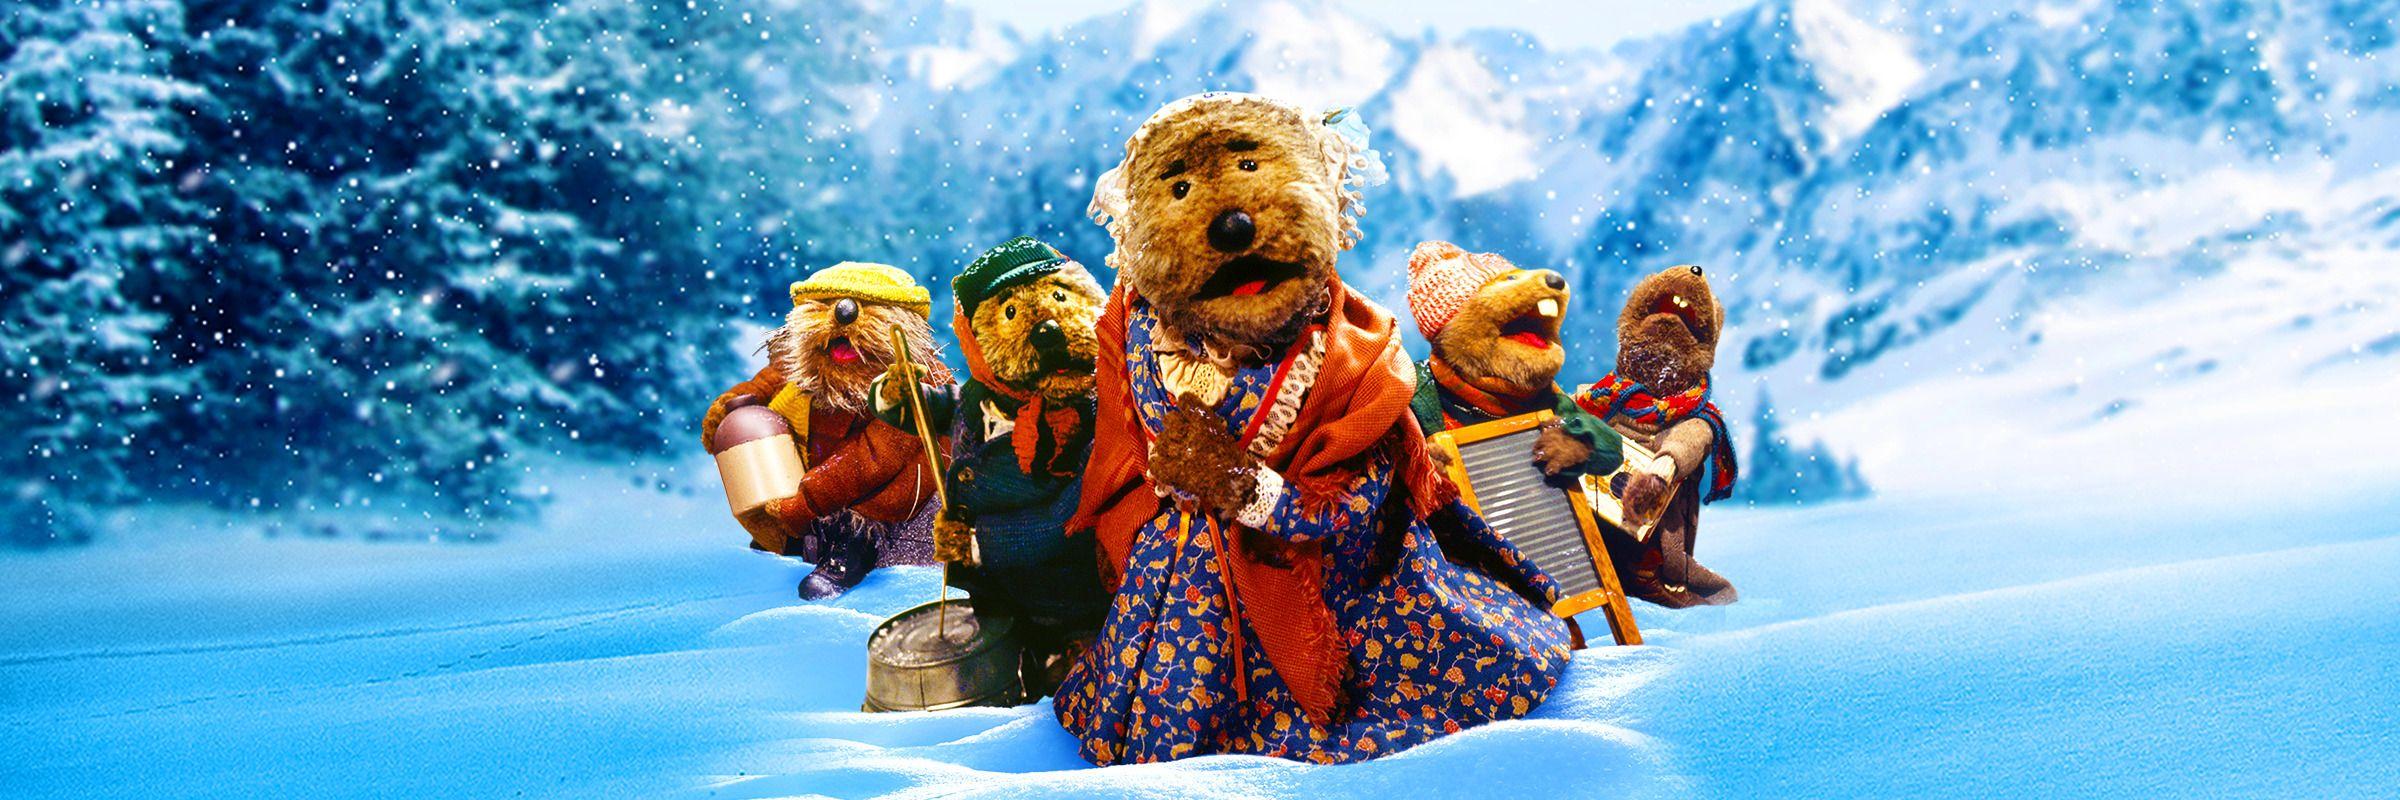 Emmet Otter Jug Band Christmas.Emmet Otter S Jug Band Christmas Full Movie Movies Anywhere